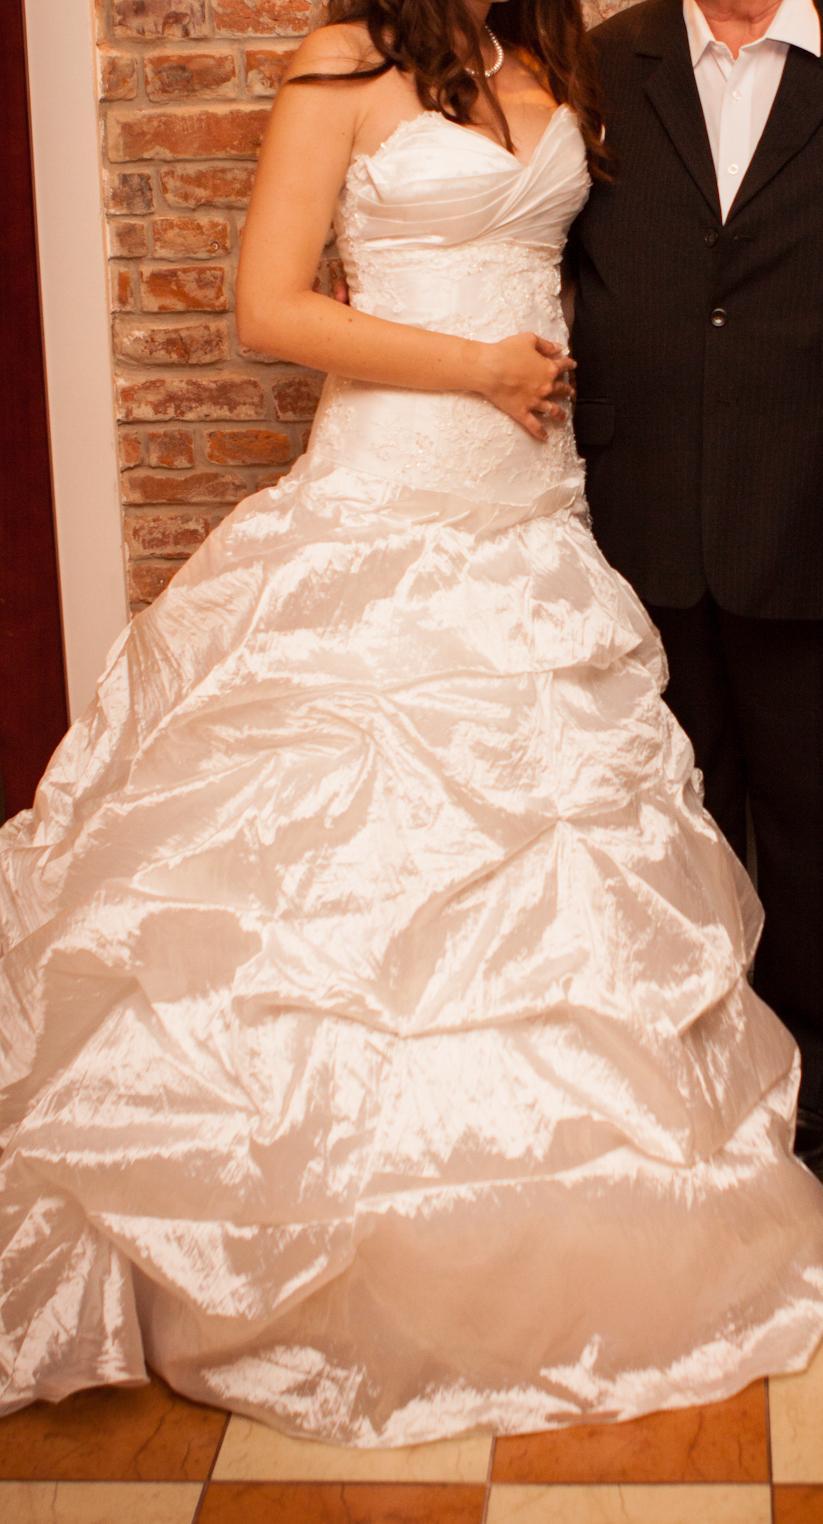 dee9e0af48d1 Talianske svadobne saty